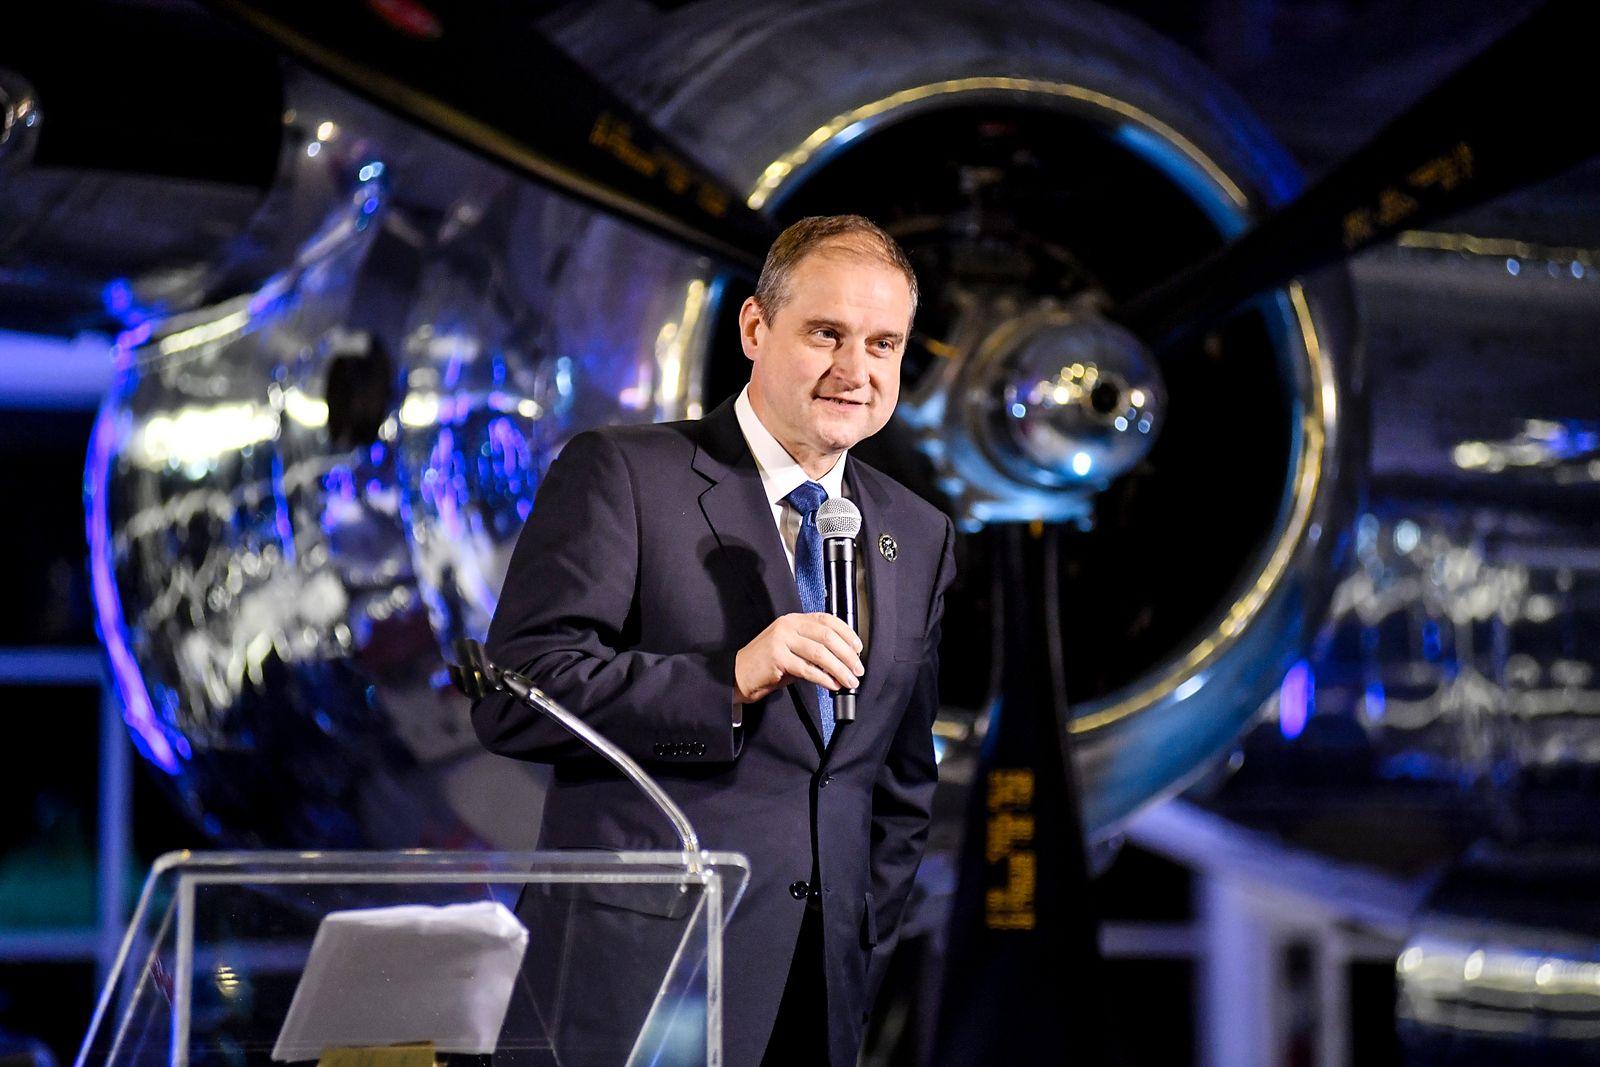 Elite Aerospace Group's 4th Annual Aerospace & Defense Symposium